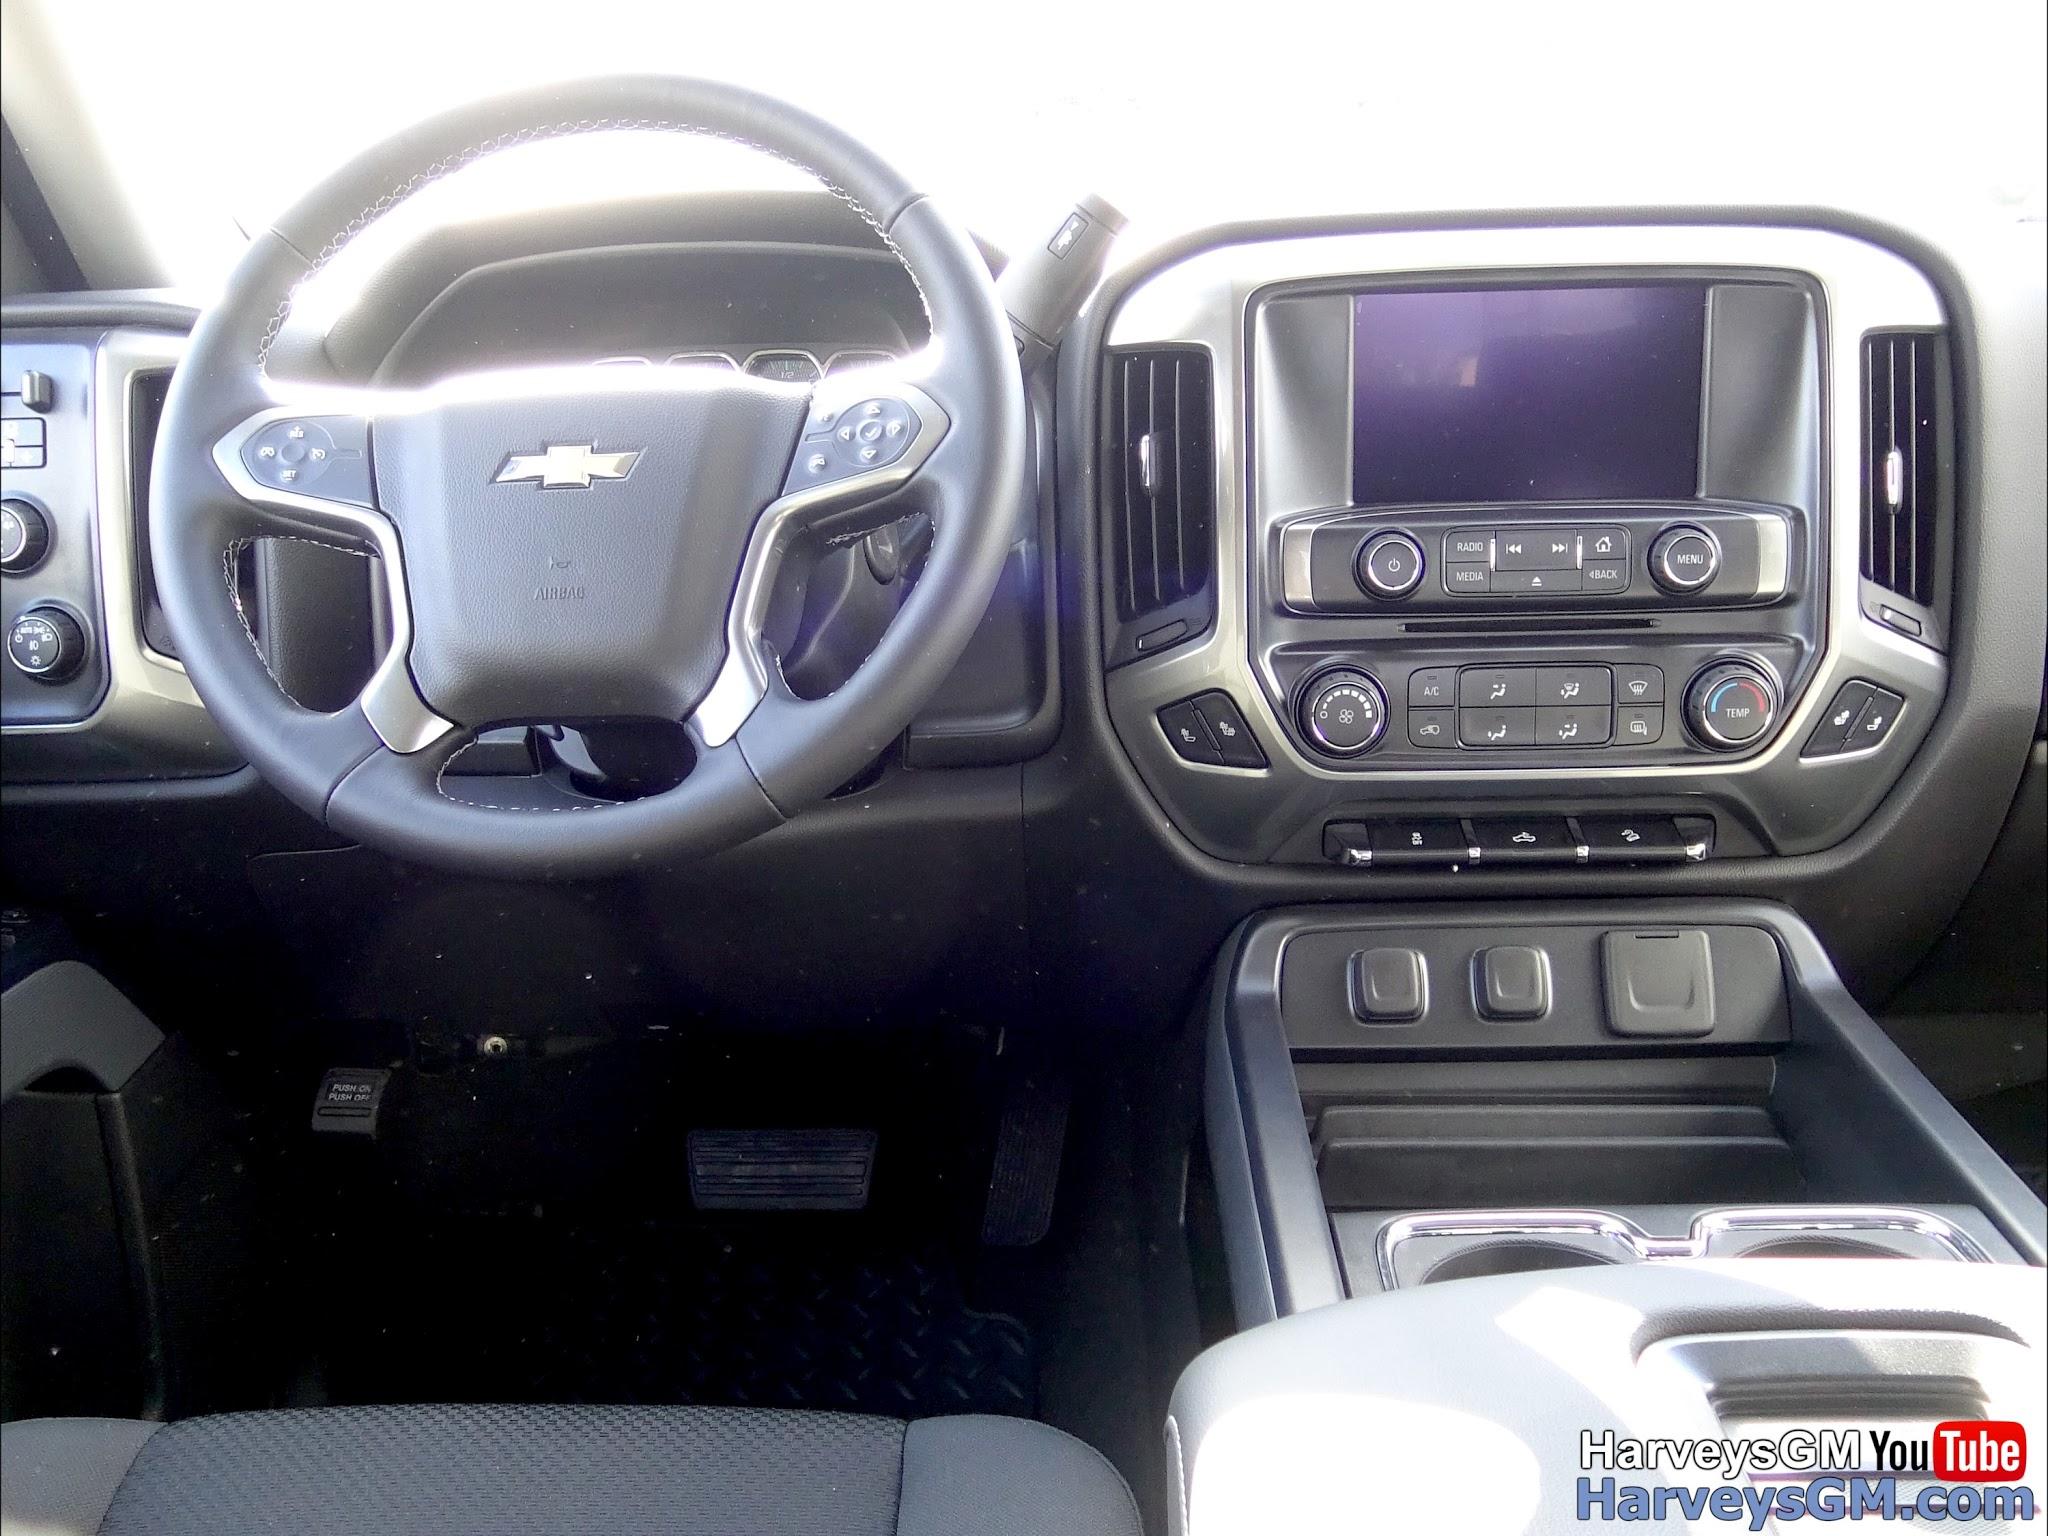 2016 Chevy Silverado Trailer Brake Controller Best 2018 Electric Wiring Harness Westin 65 77685